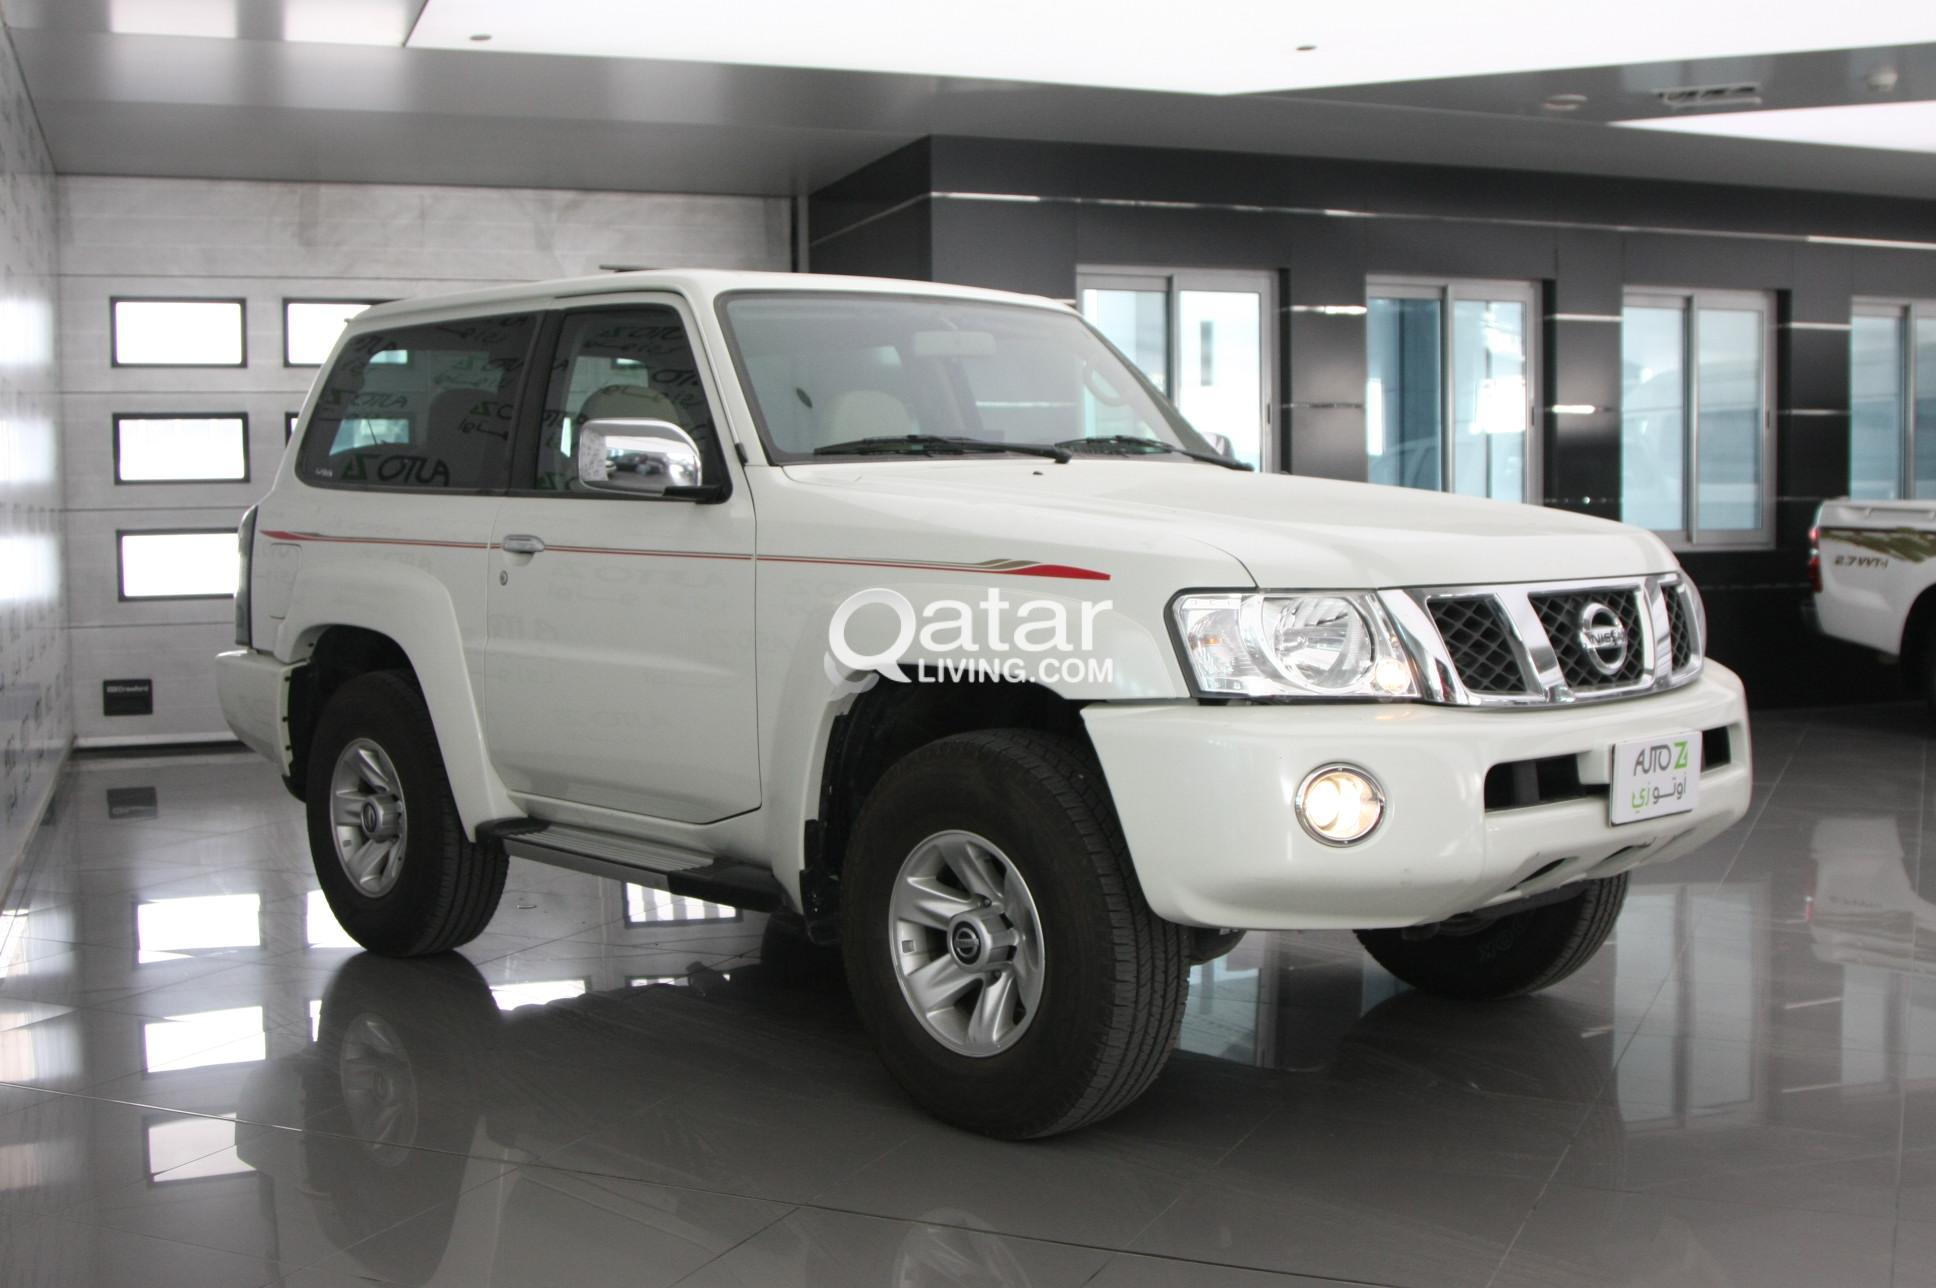 Nissan Patrol Safari 2016   Qatar Living